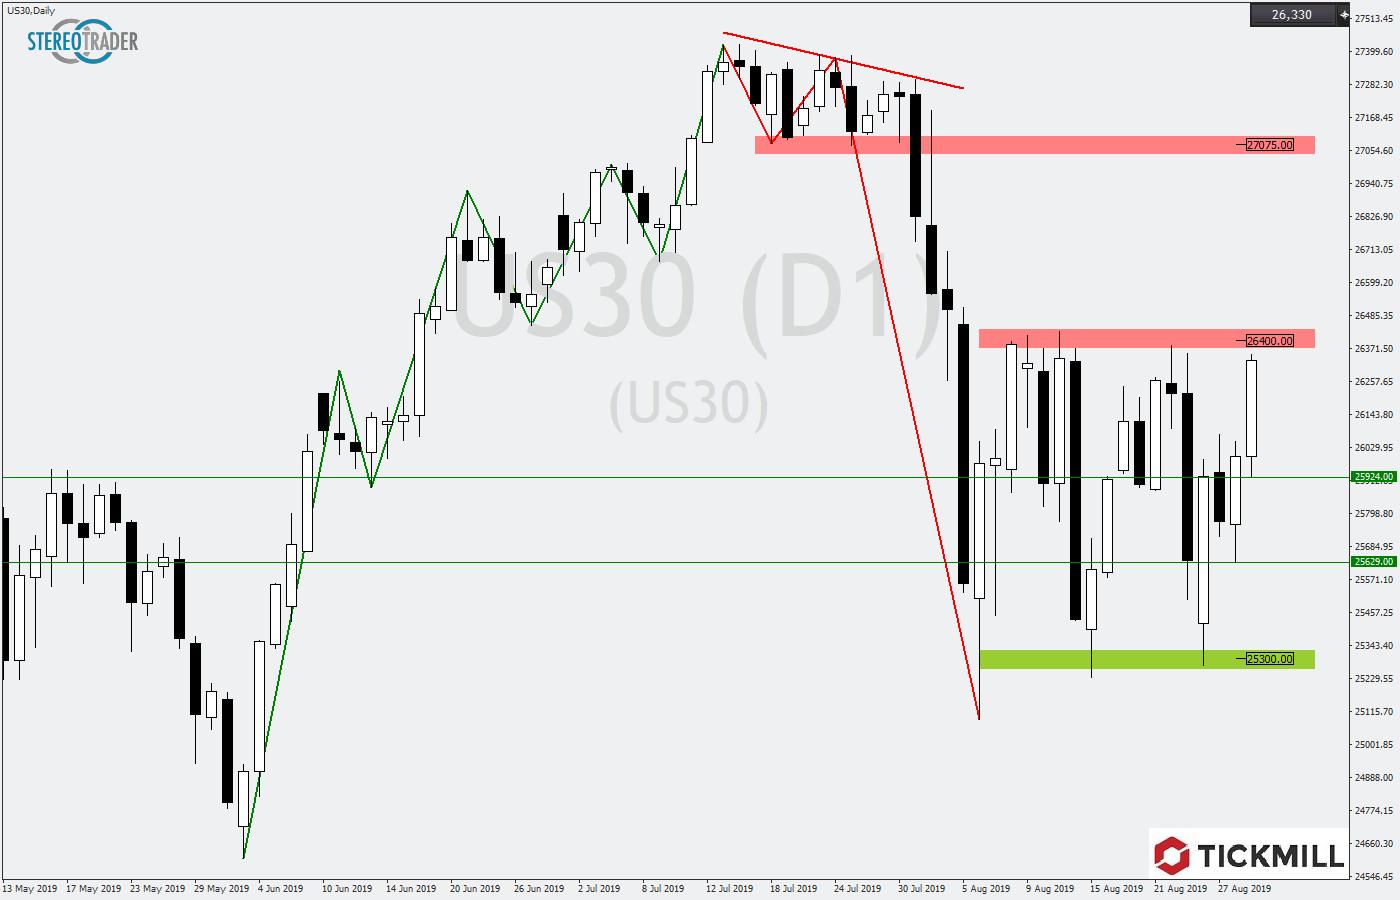 Tickmill-Analyse: Dow Jones am Widerstand